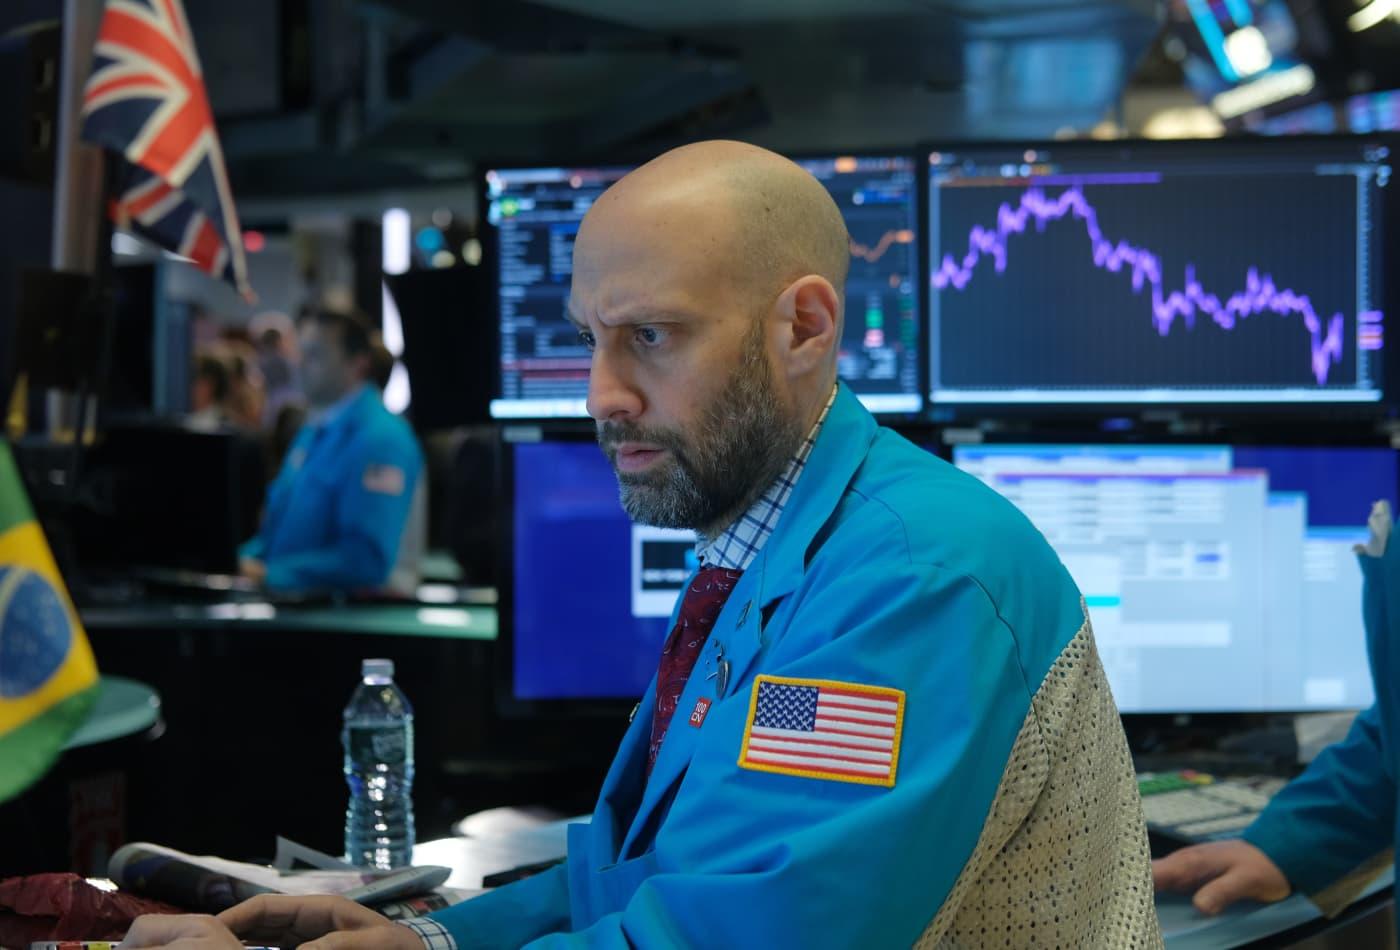 Stock market investors are 'piled up' in a historically failing trade, JPMorgan warns